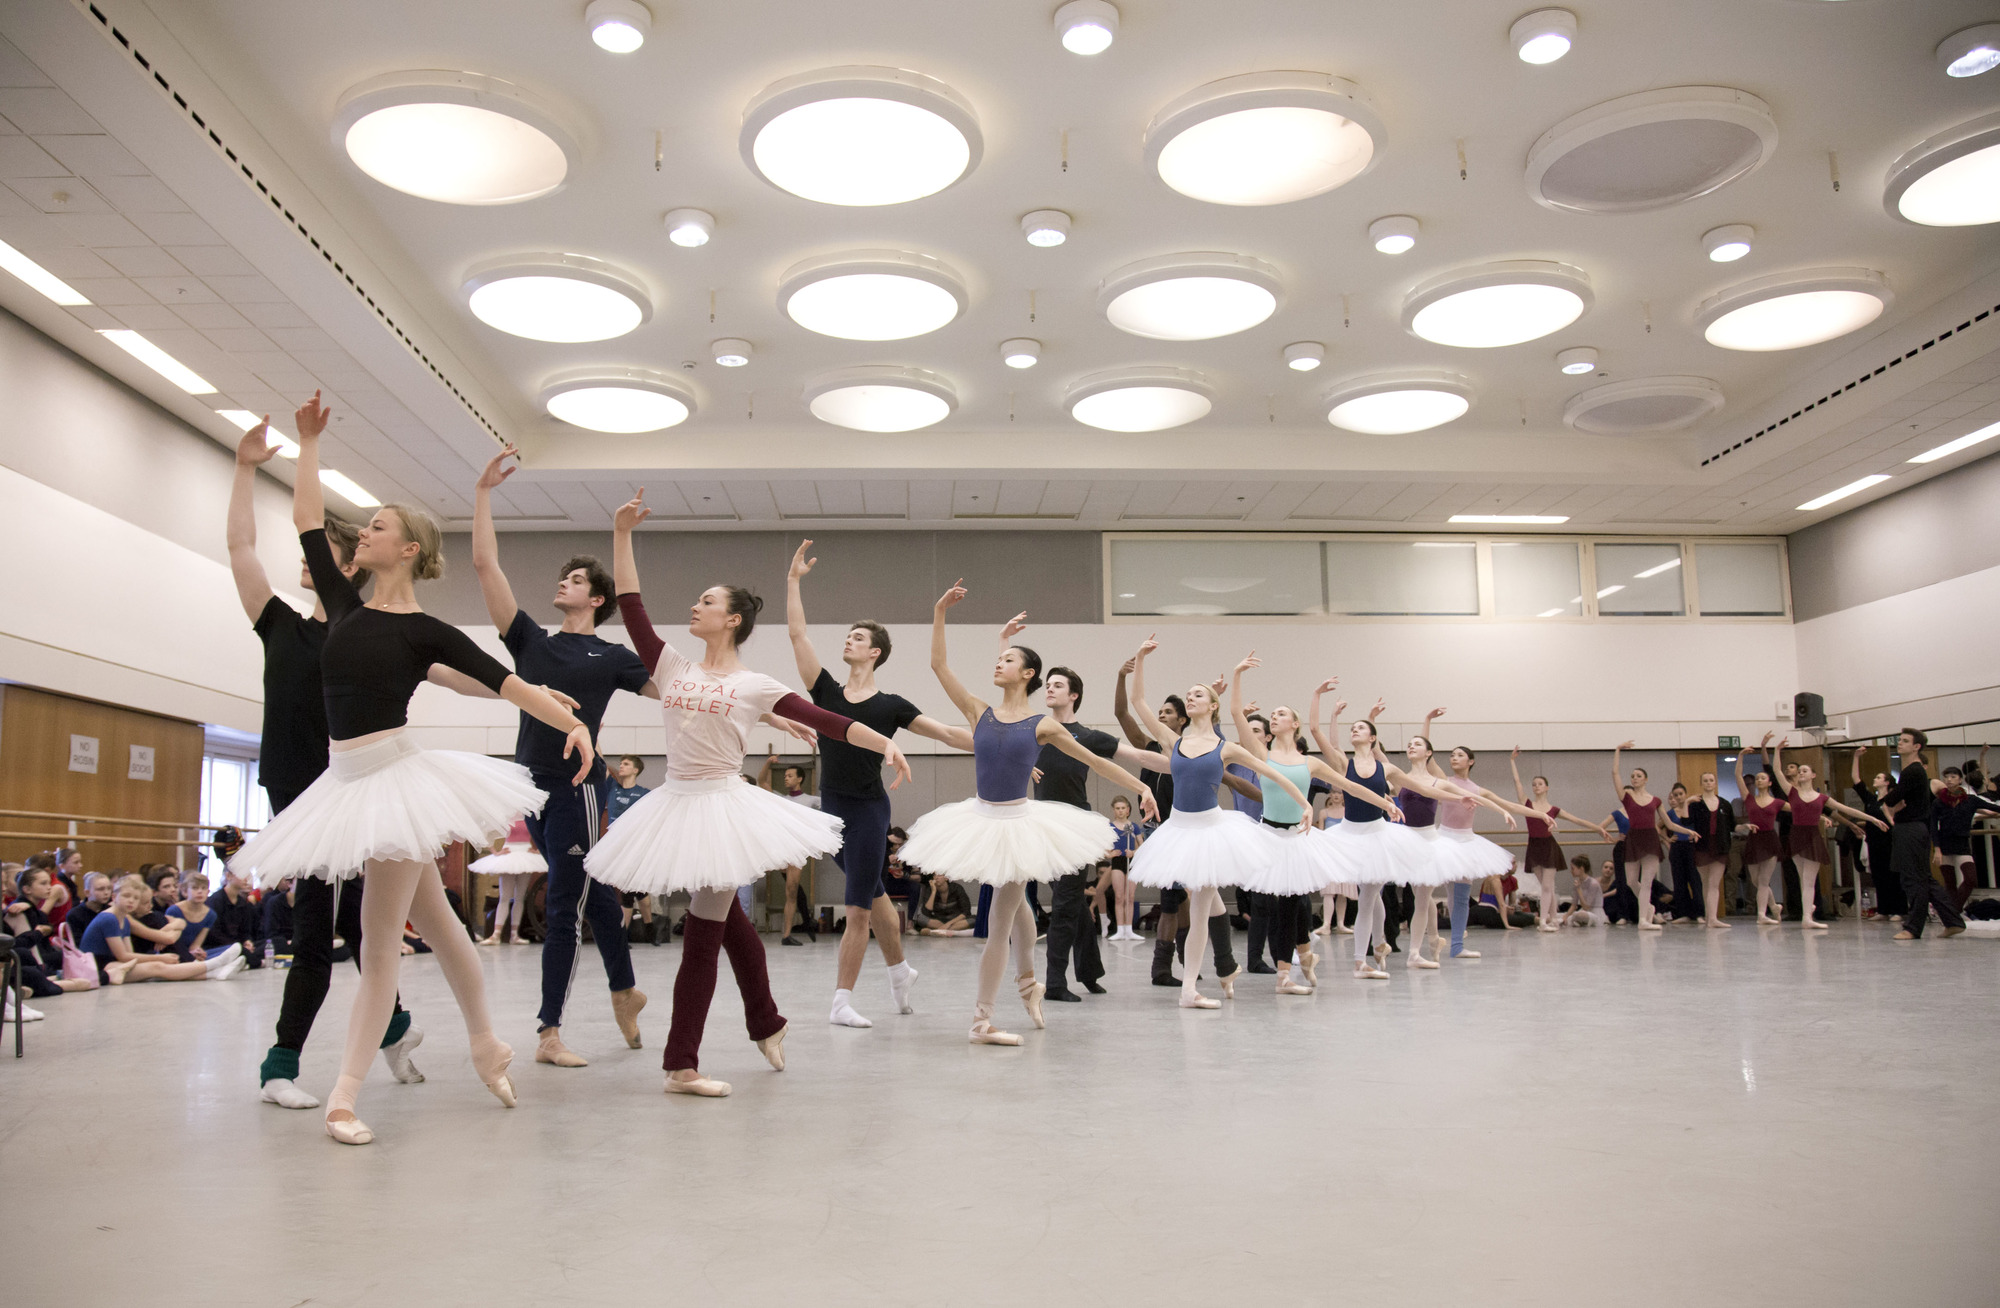 Ballet News Previews | Dancing The Nutcracker - Inside The